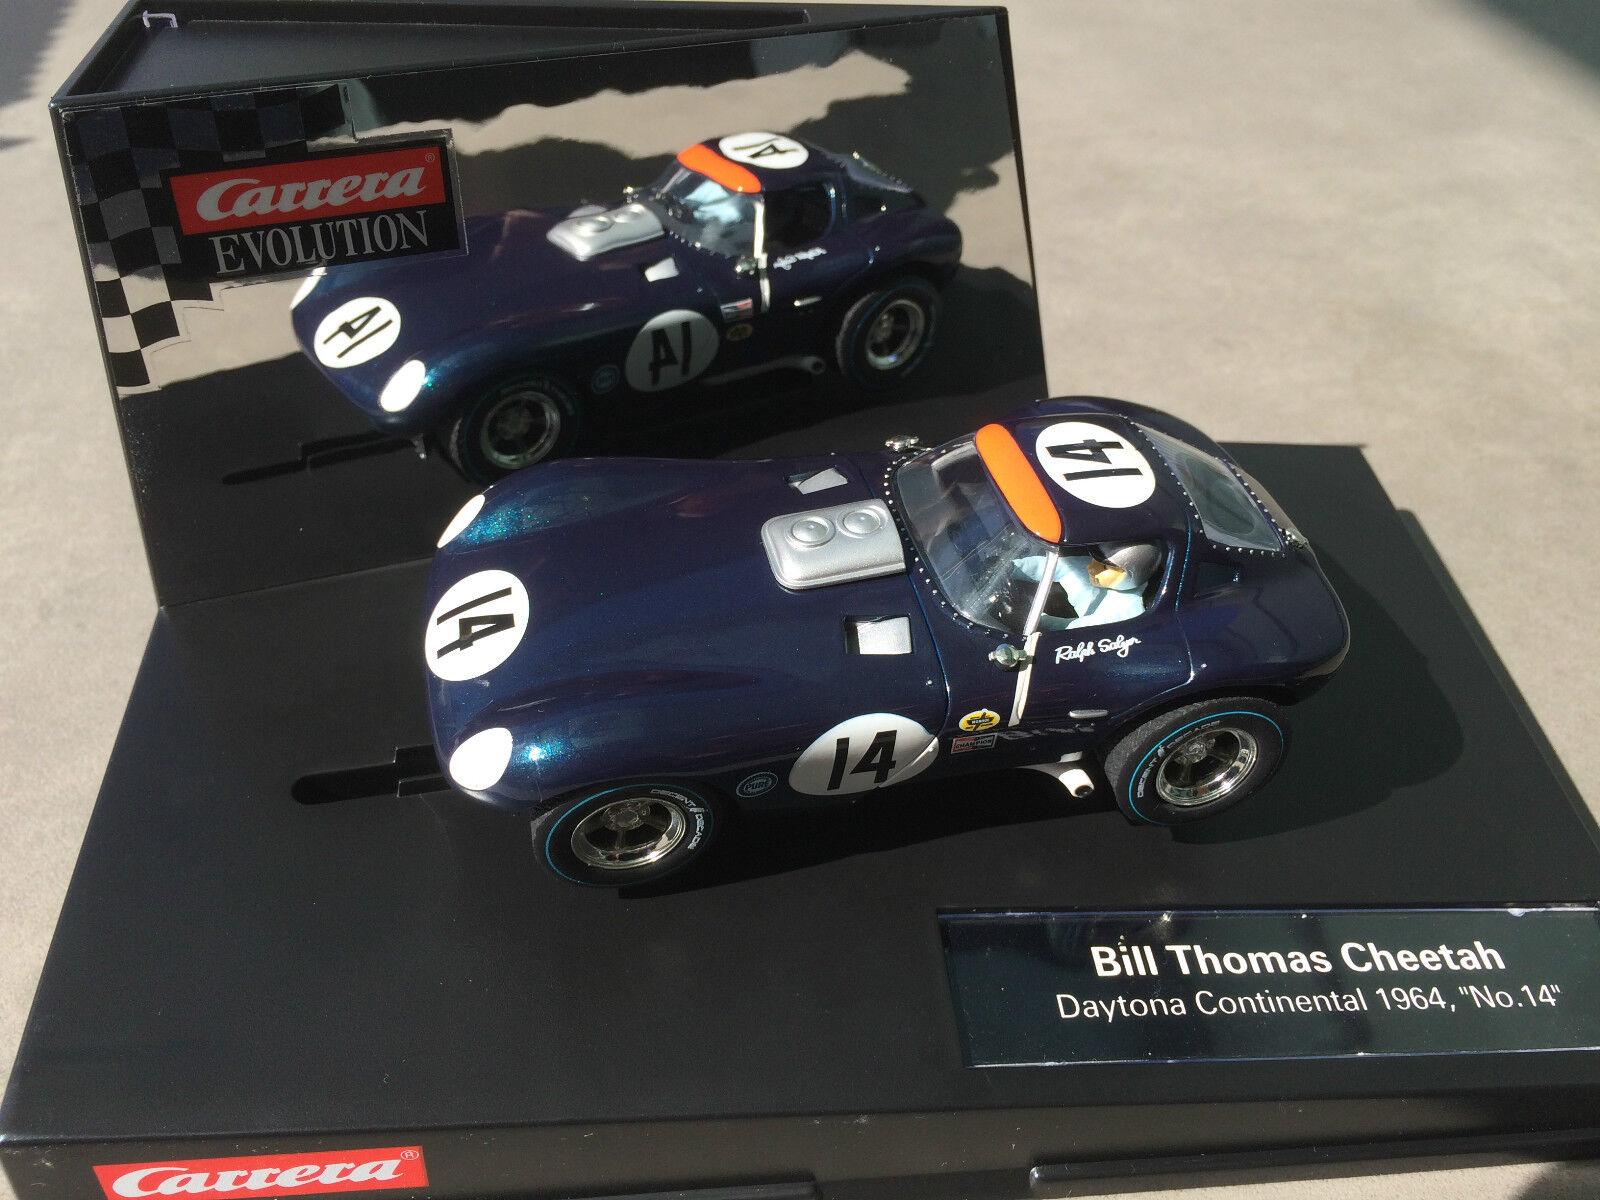 Carrera Evolution 27414 BILL THOMAS CHEETAH DAYTONA CONTINENTAL 1964, no.14 NEW